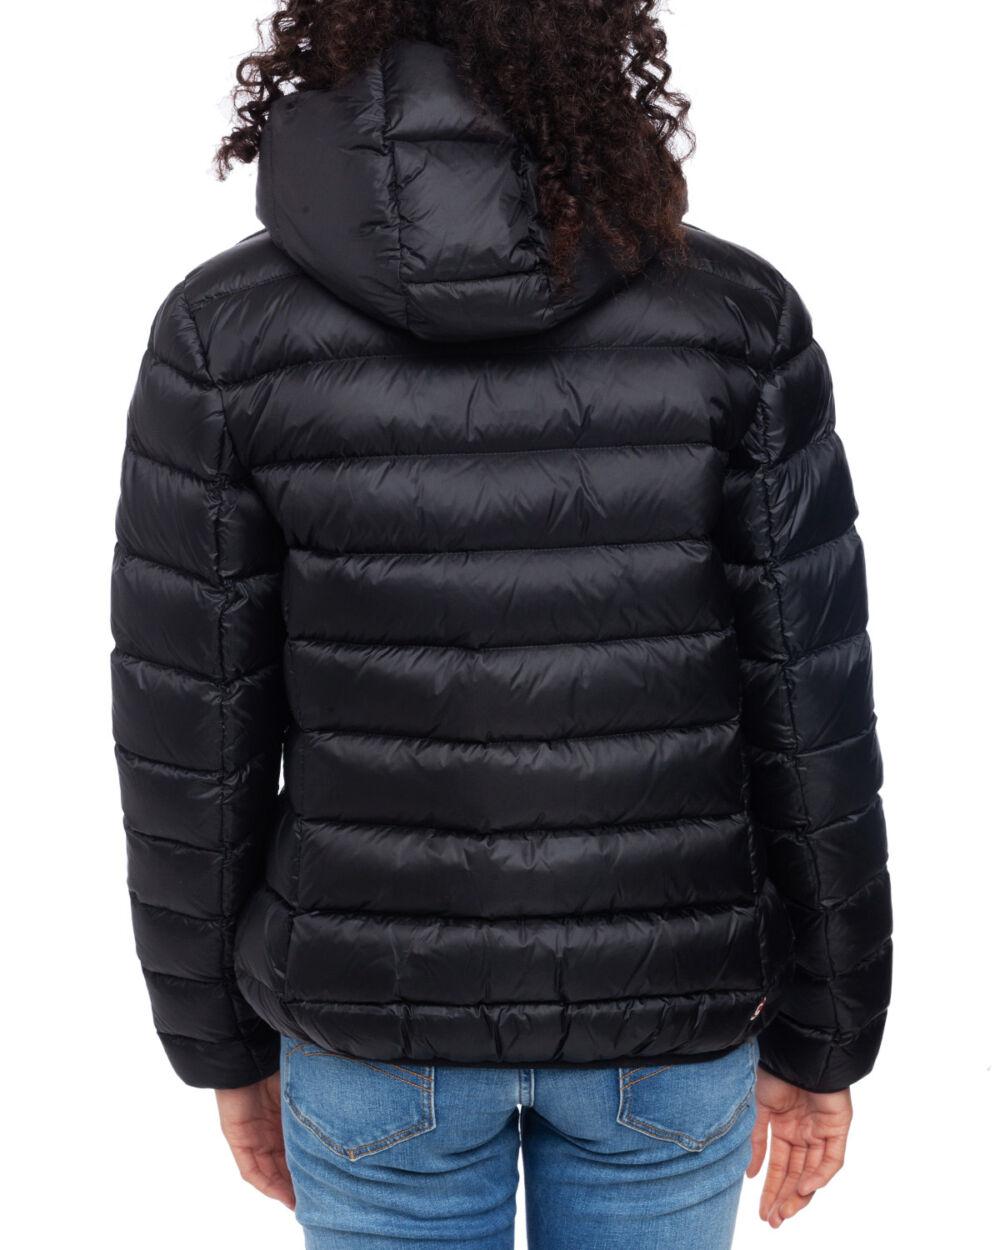 Junior 3459K 7QD Black